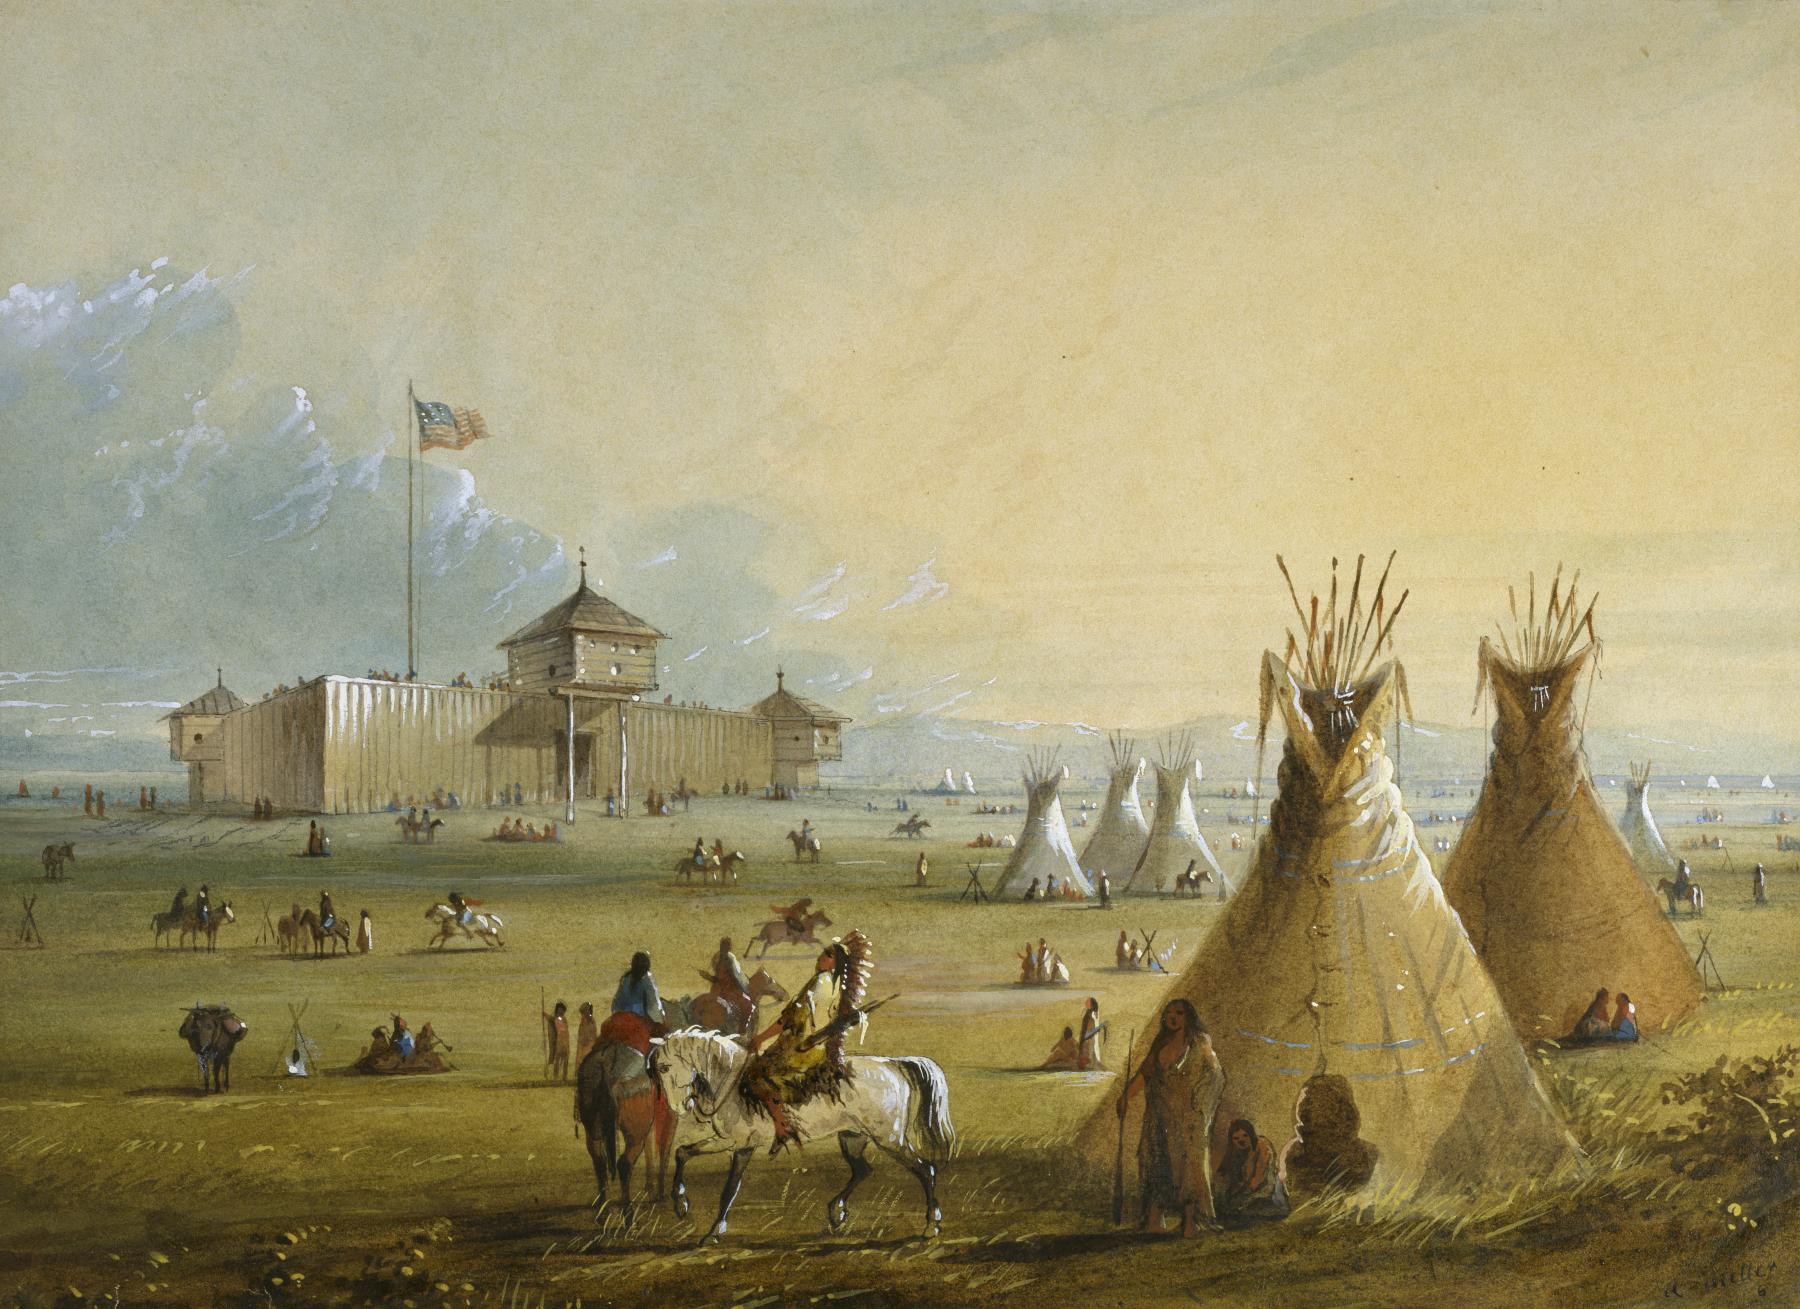 Laramie's Fort